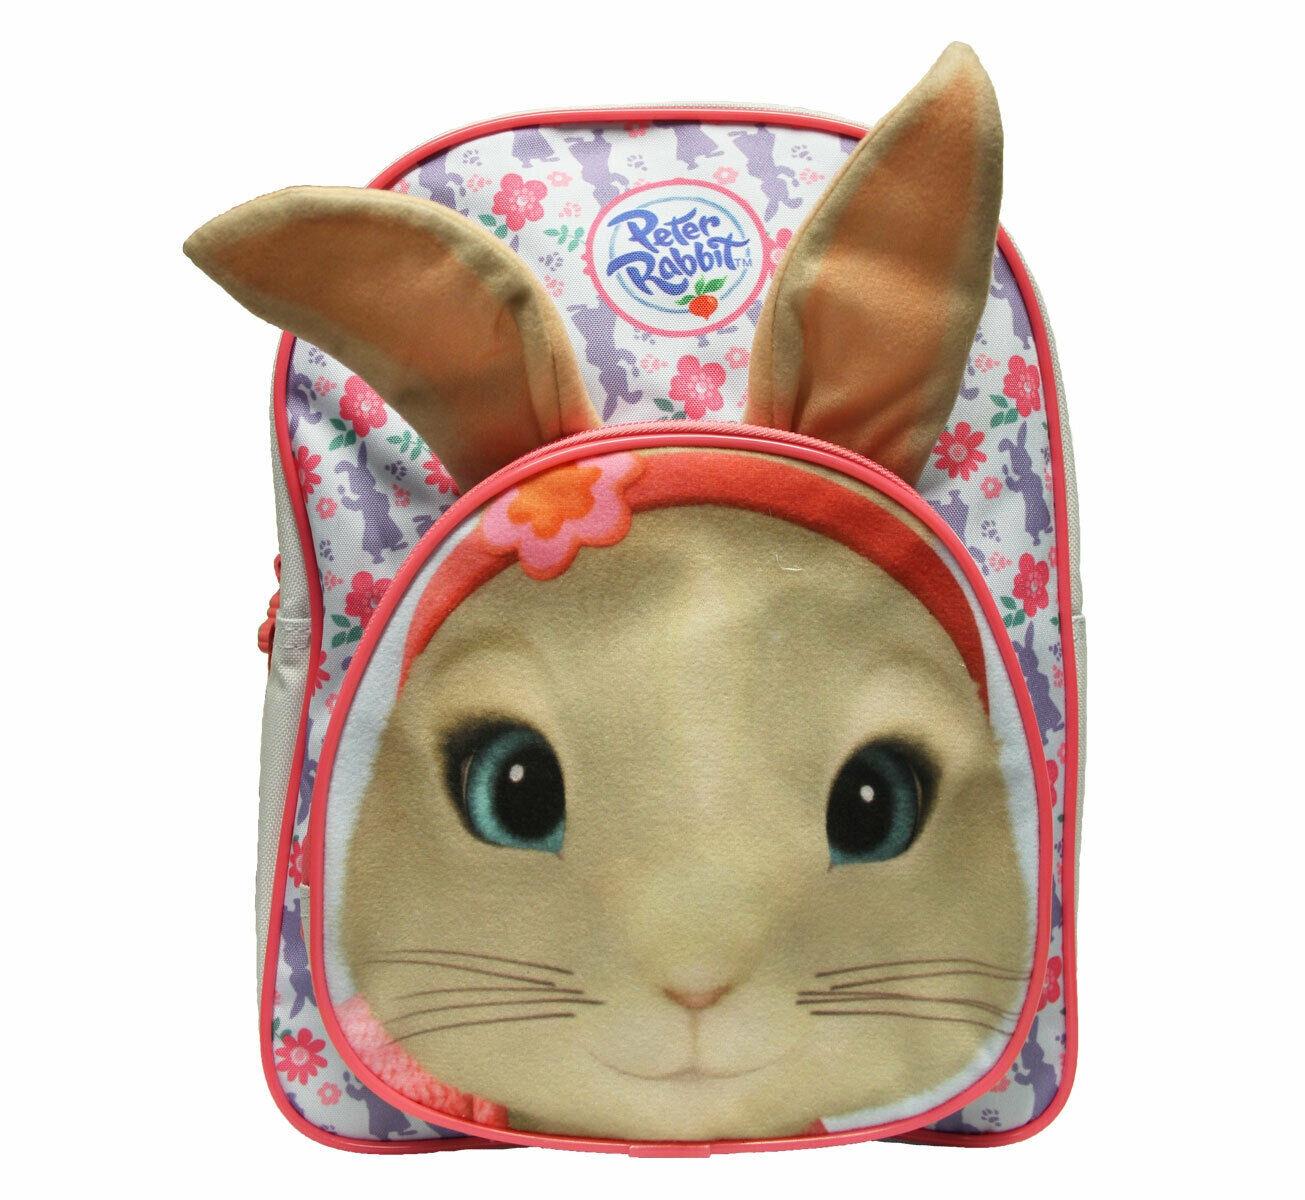 Peter Rabbit Girls Floral Print Blue/pink School Bag Rucksack Backpack